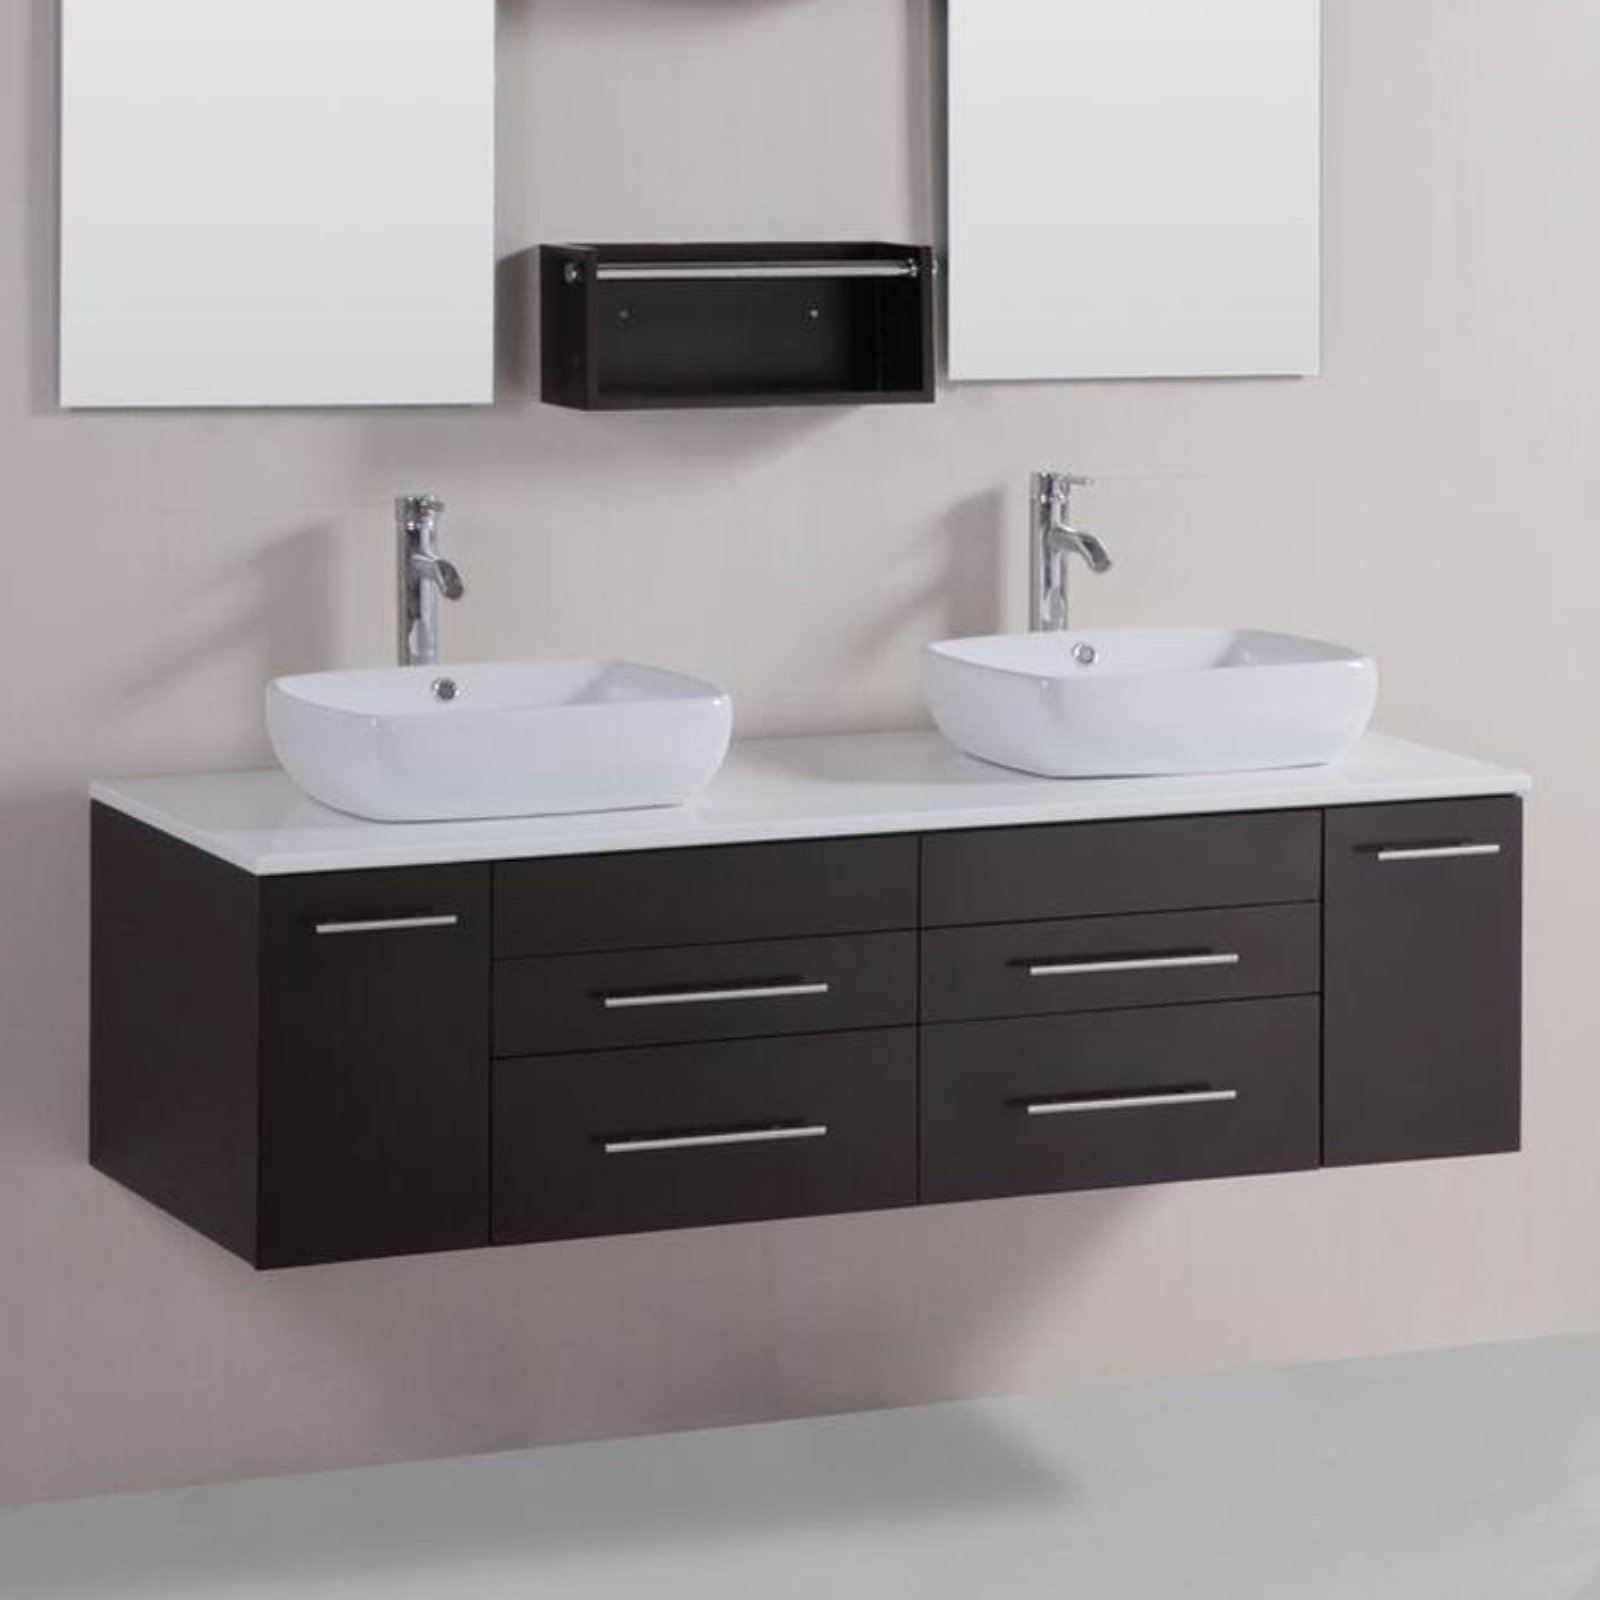 Modern Double Vessel Bathroom Vanity With Stone Top